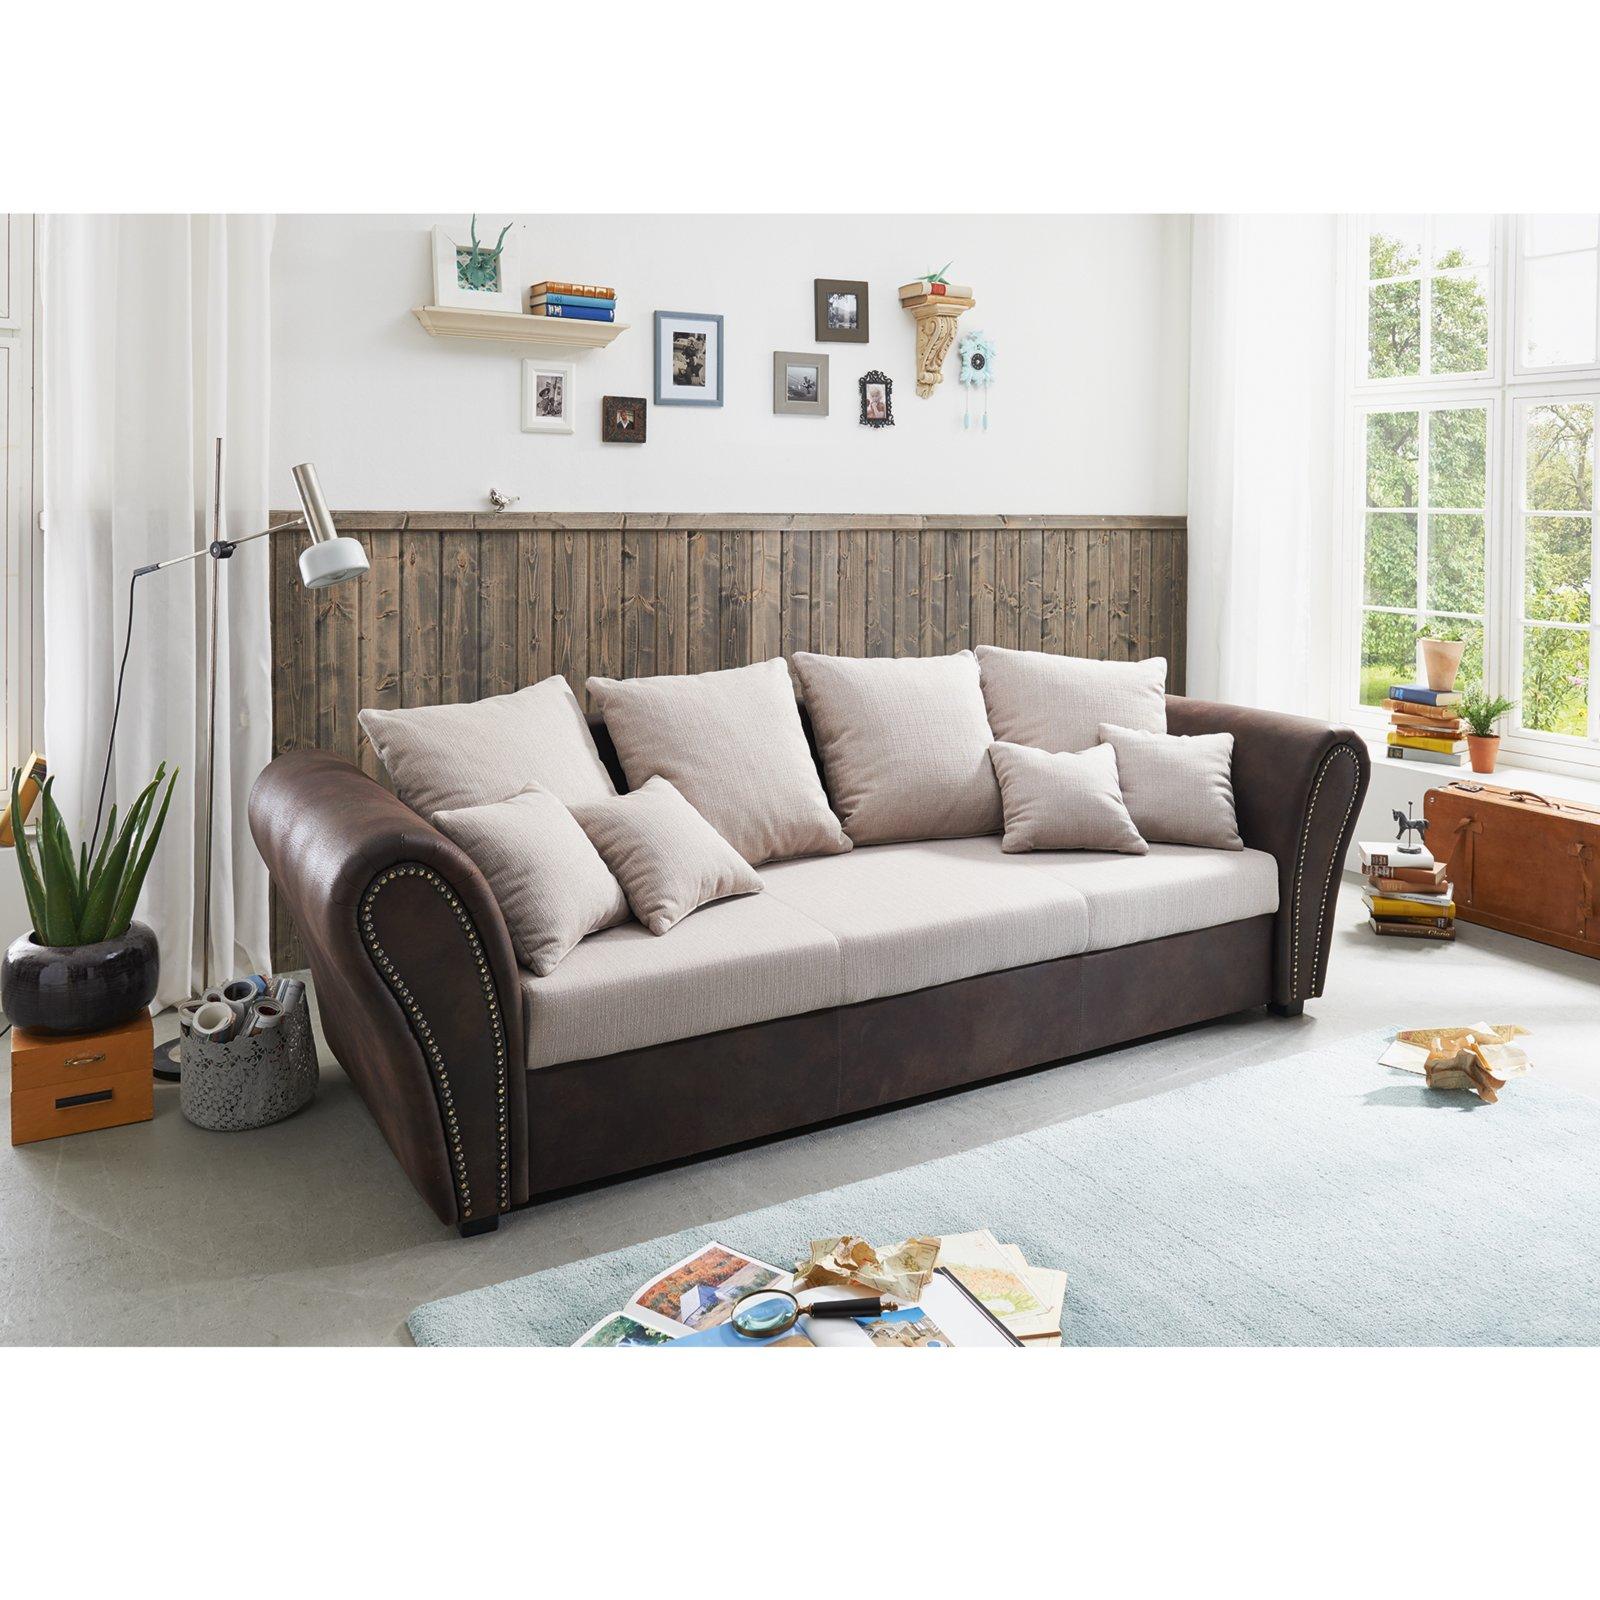 big sofa beige braun mit liegefunktion ebay. Black Bedroom Furniture Sets. Home Design Ideas